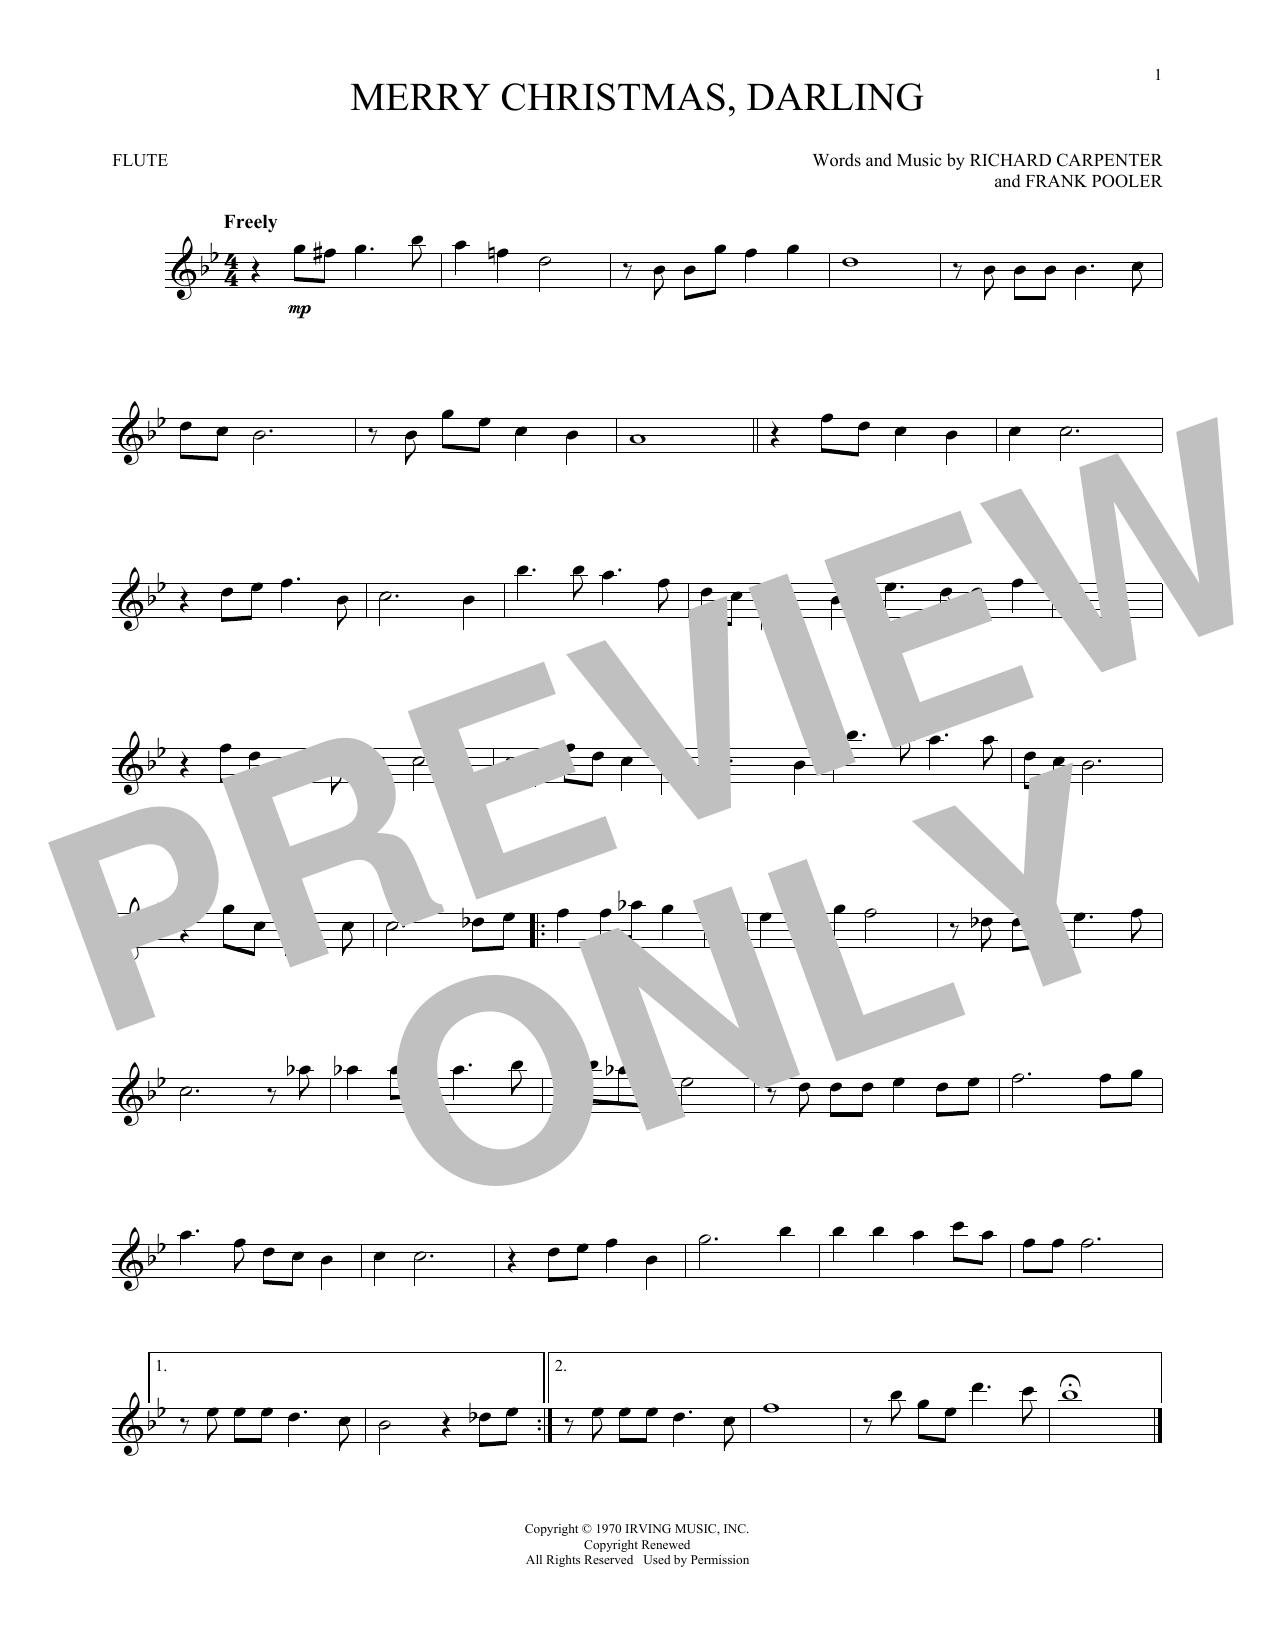 Sheet Music Digital Files To Print - Licensed Frank Pooler Digital ...